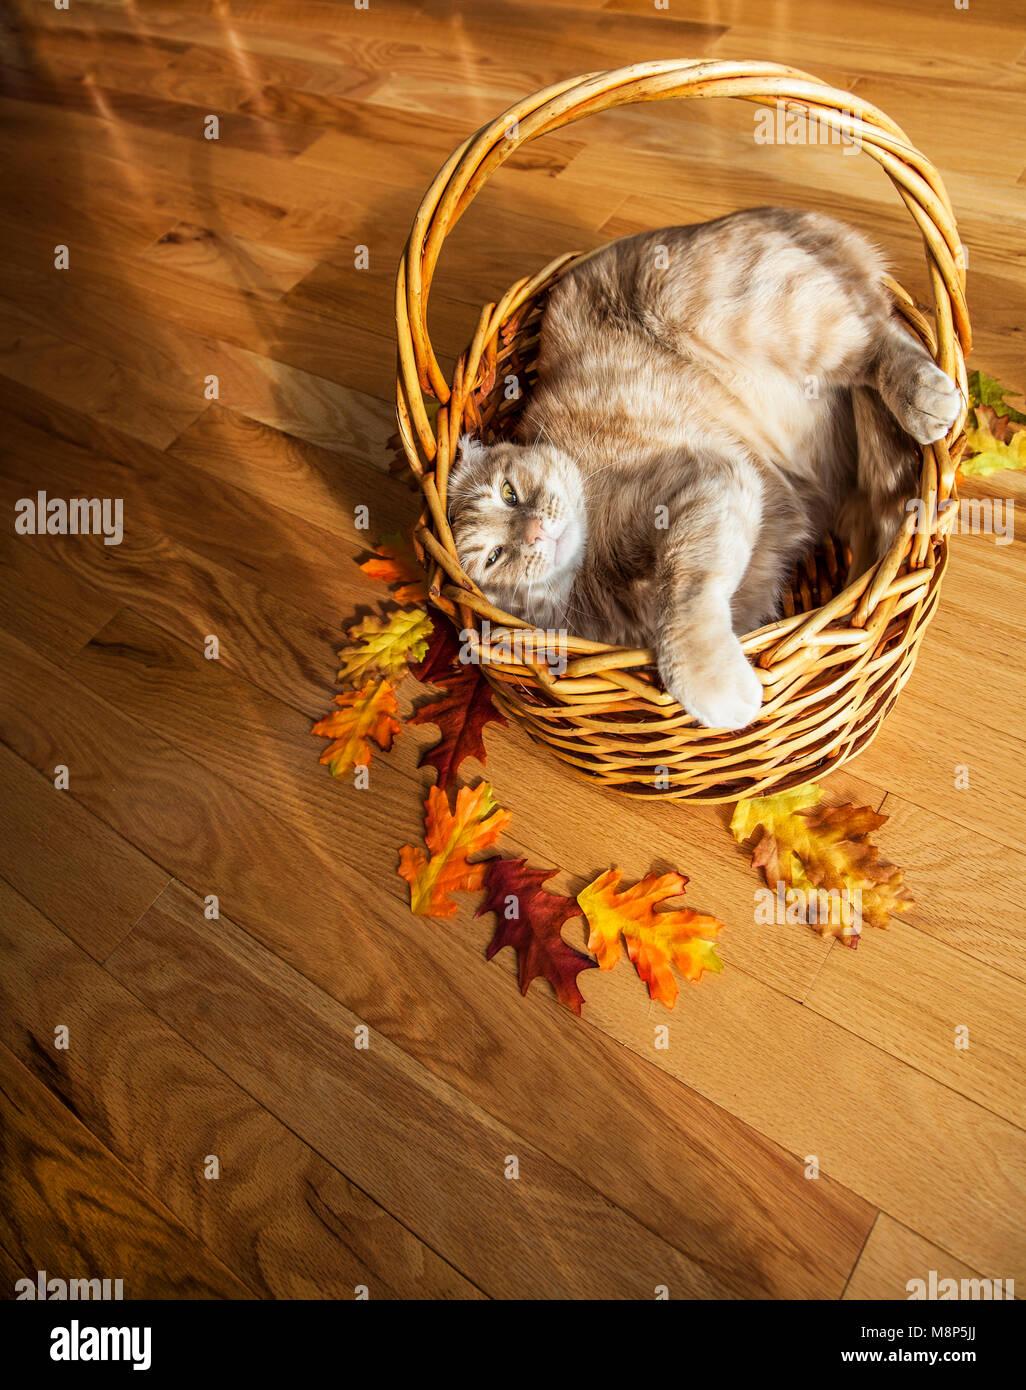 Domestic orange tabby cat in a basket, autumn leaves, New Jersey, USA, Pantone orange, Nov 2017,  FS 11.92 MB - Stock Image